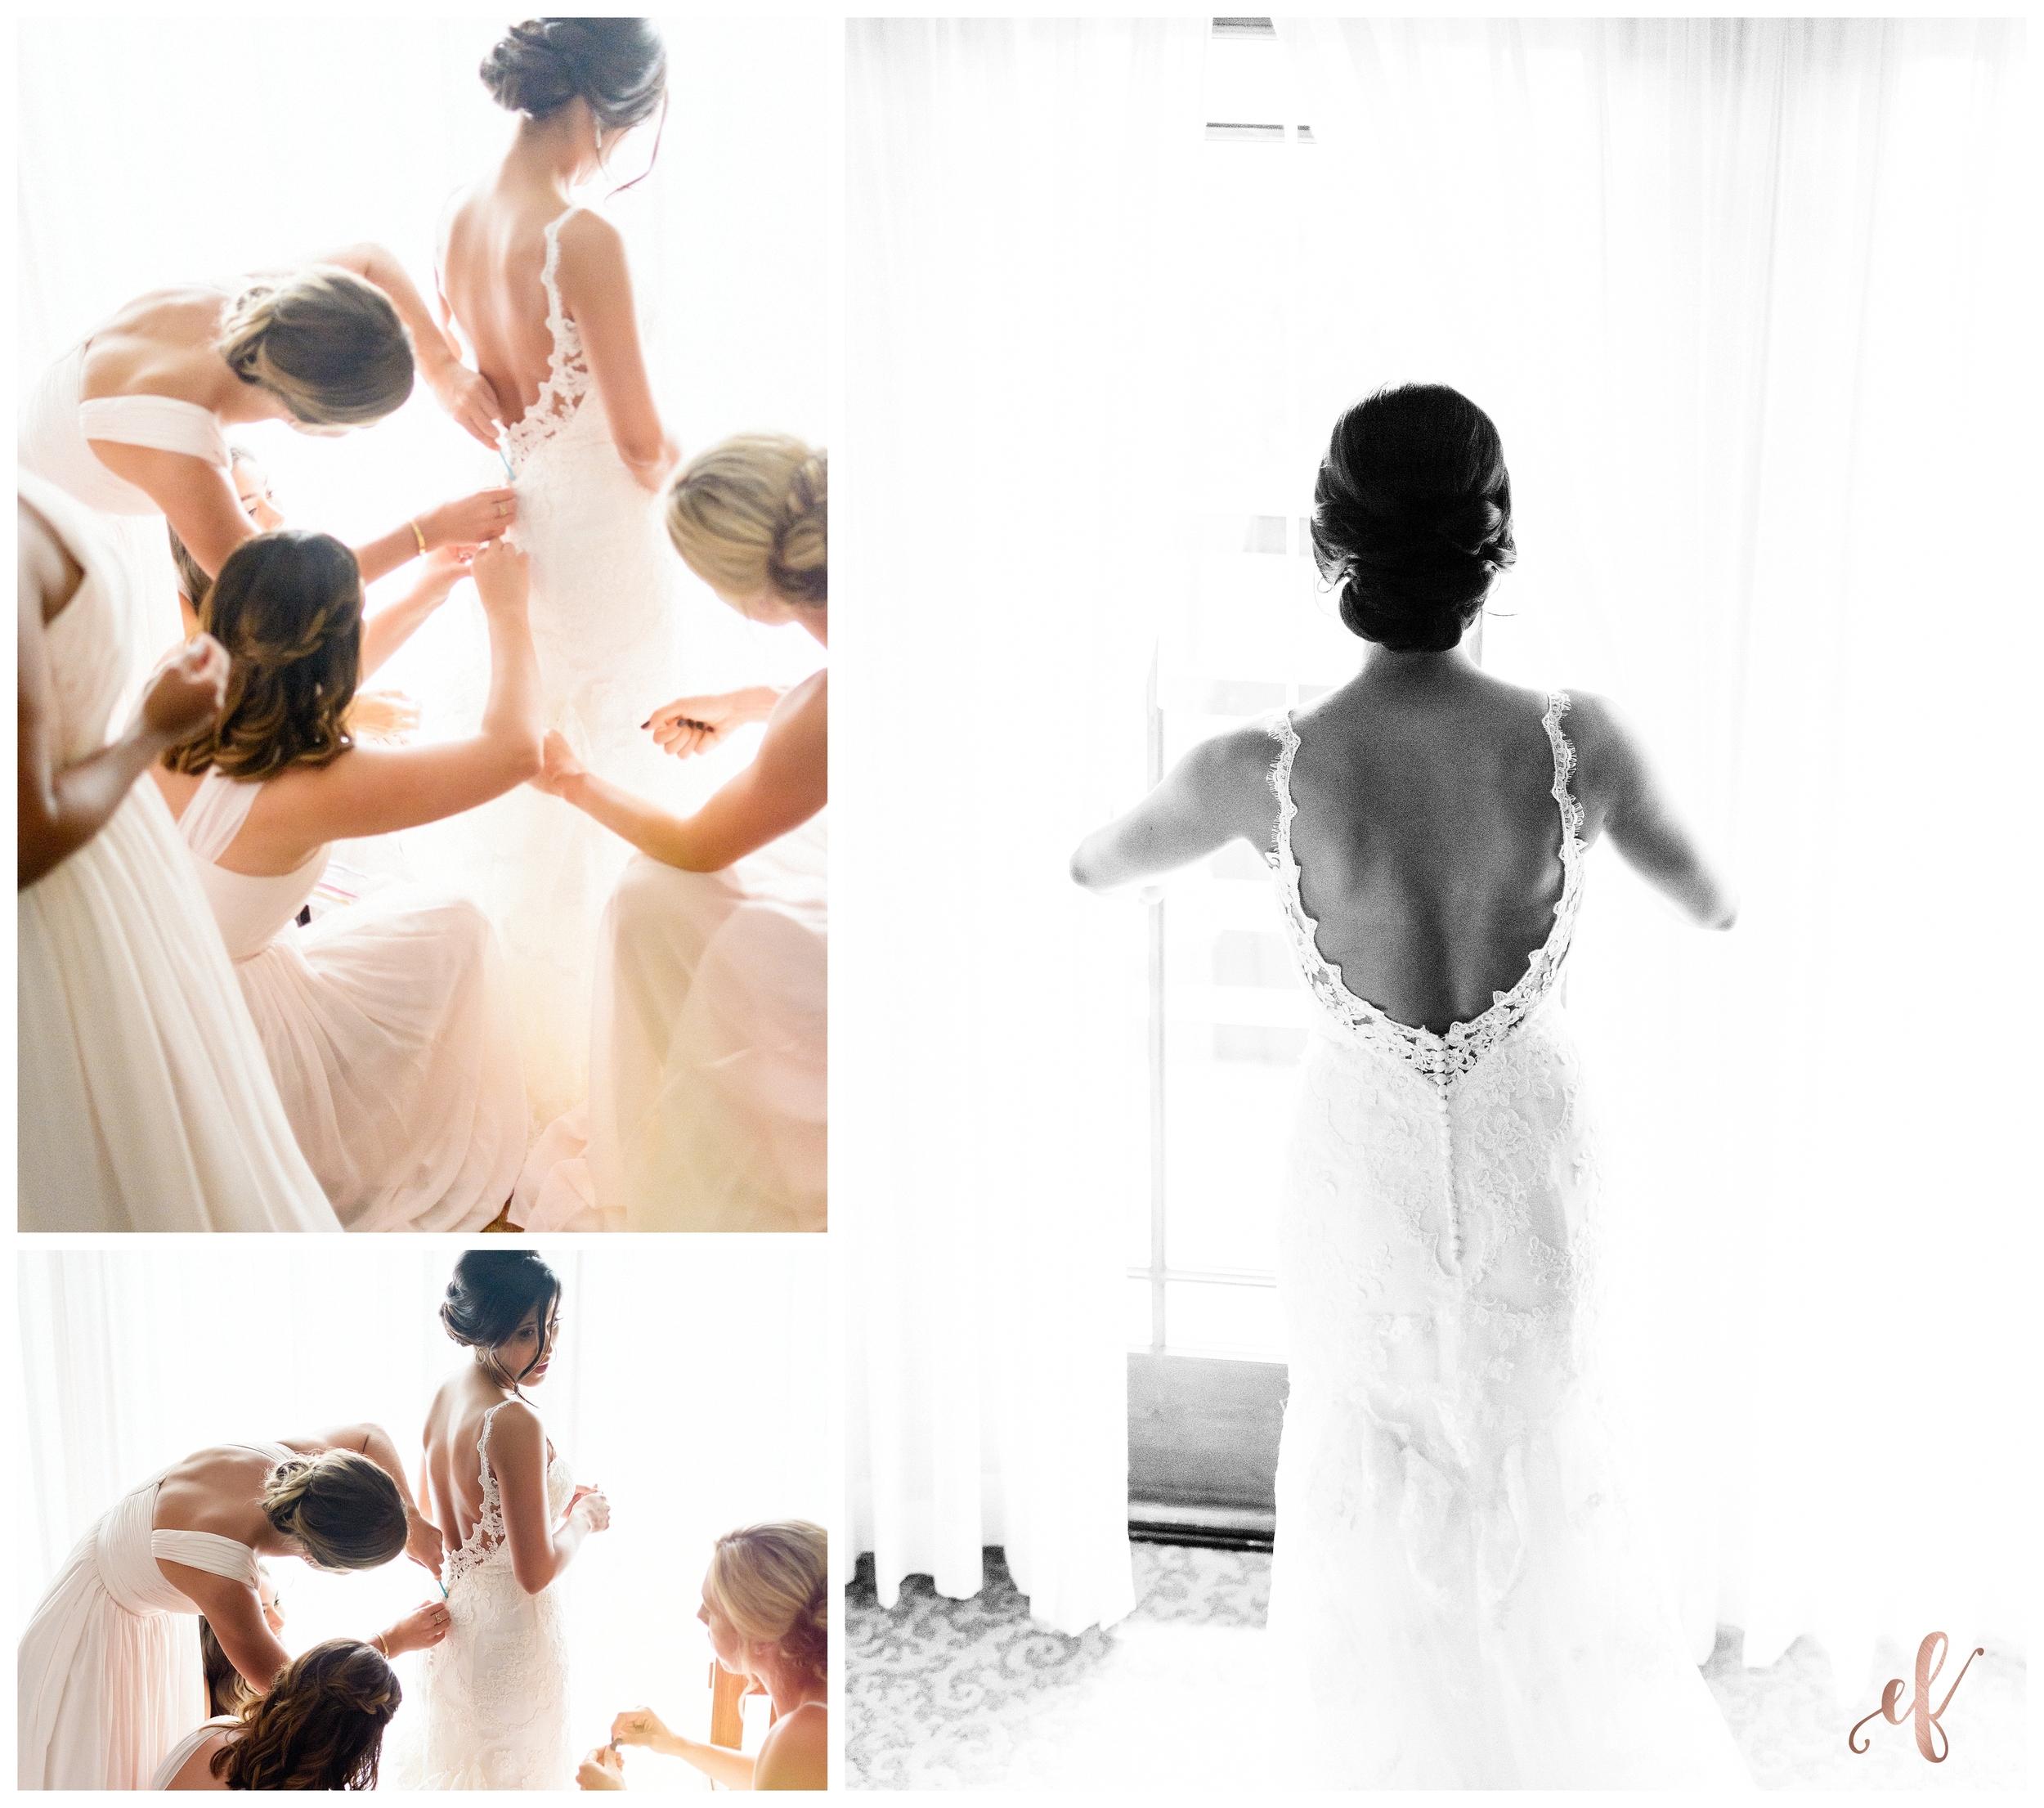 San Diego Wedding Photographer   Ernie & Fiona Photography   Getting Ready   Bride   Dress